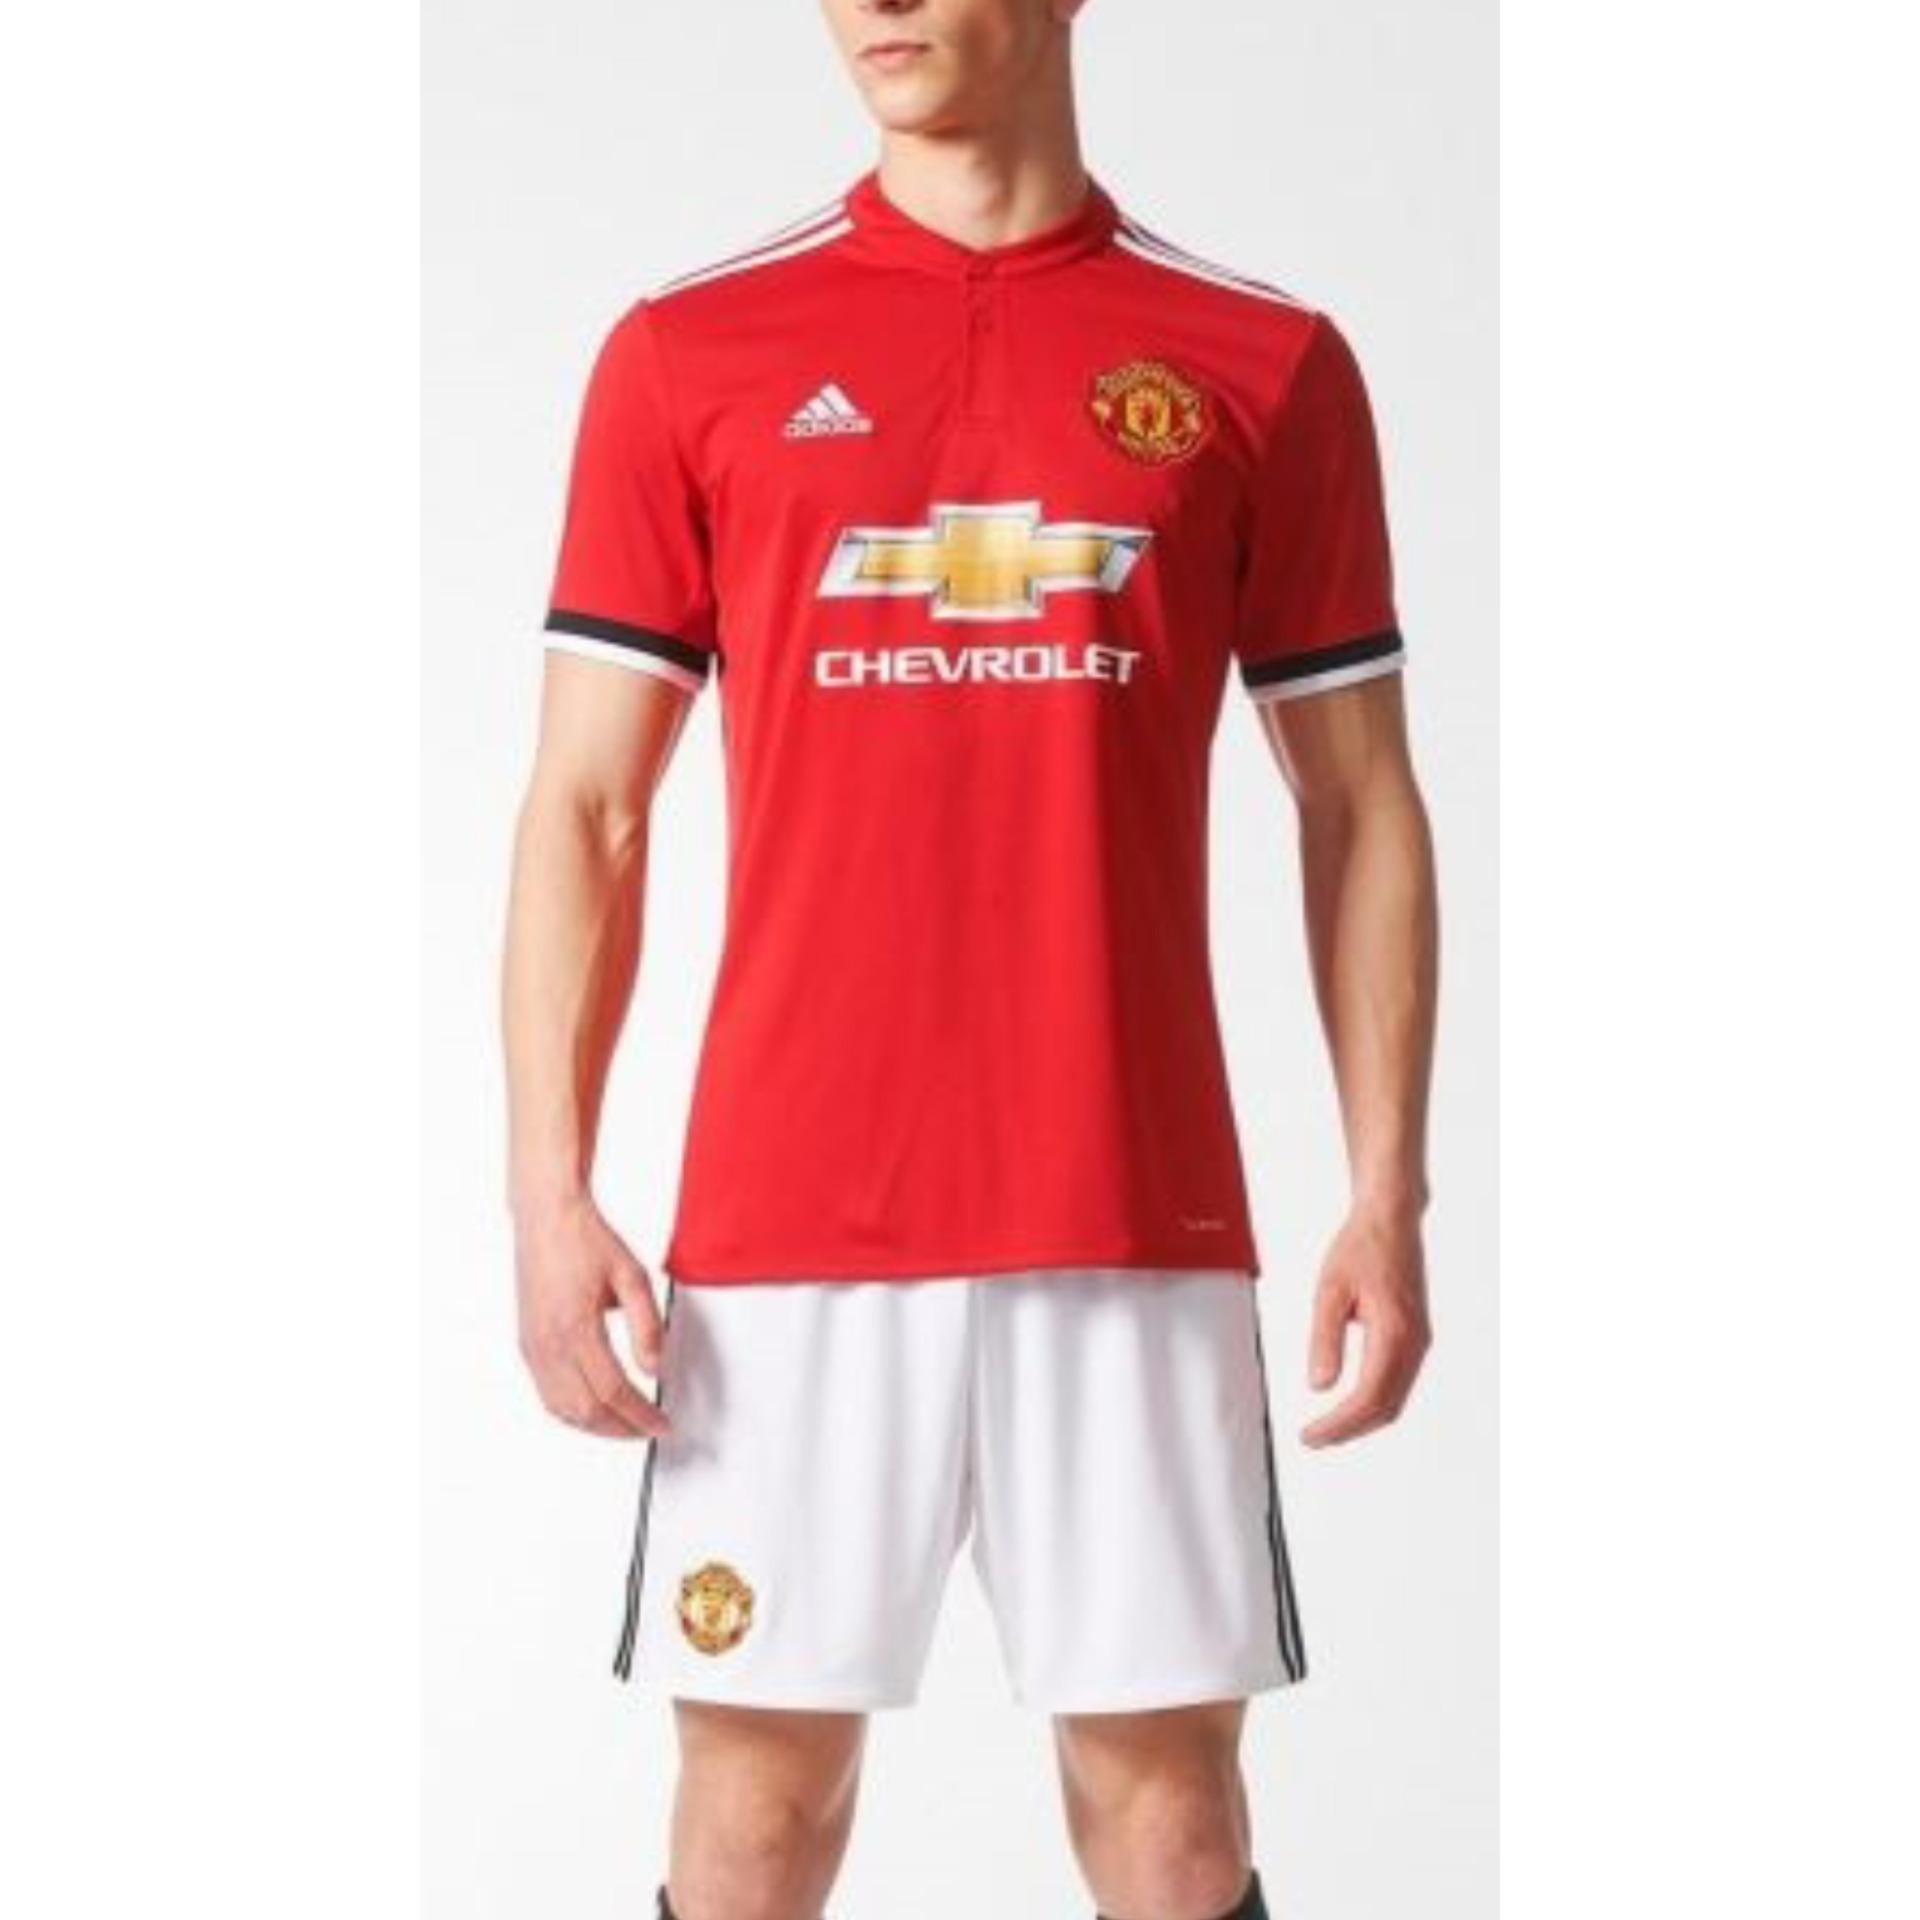 Promo Terbaik Best Seller Ad 02 Baju Futsal Jersey Olahraga Volly Kaos Tshirt Adidas 03 Zoc Bola T Shirt Mu Set Celana Home Away 3rd